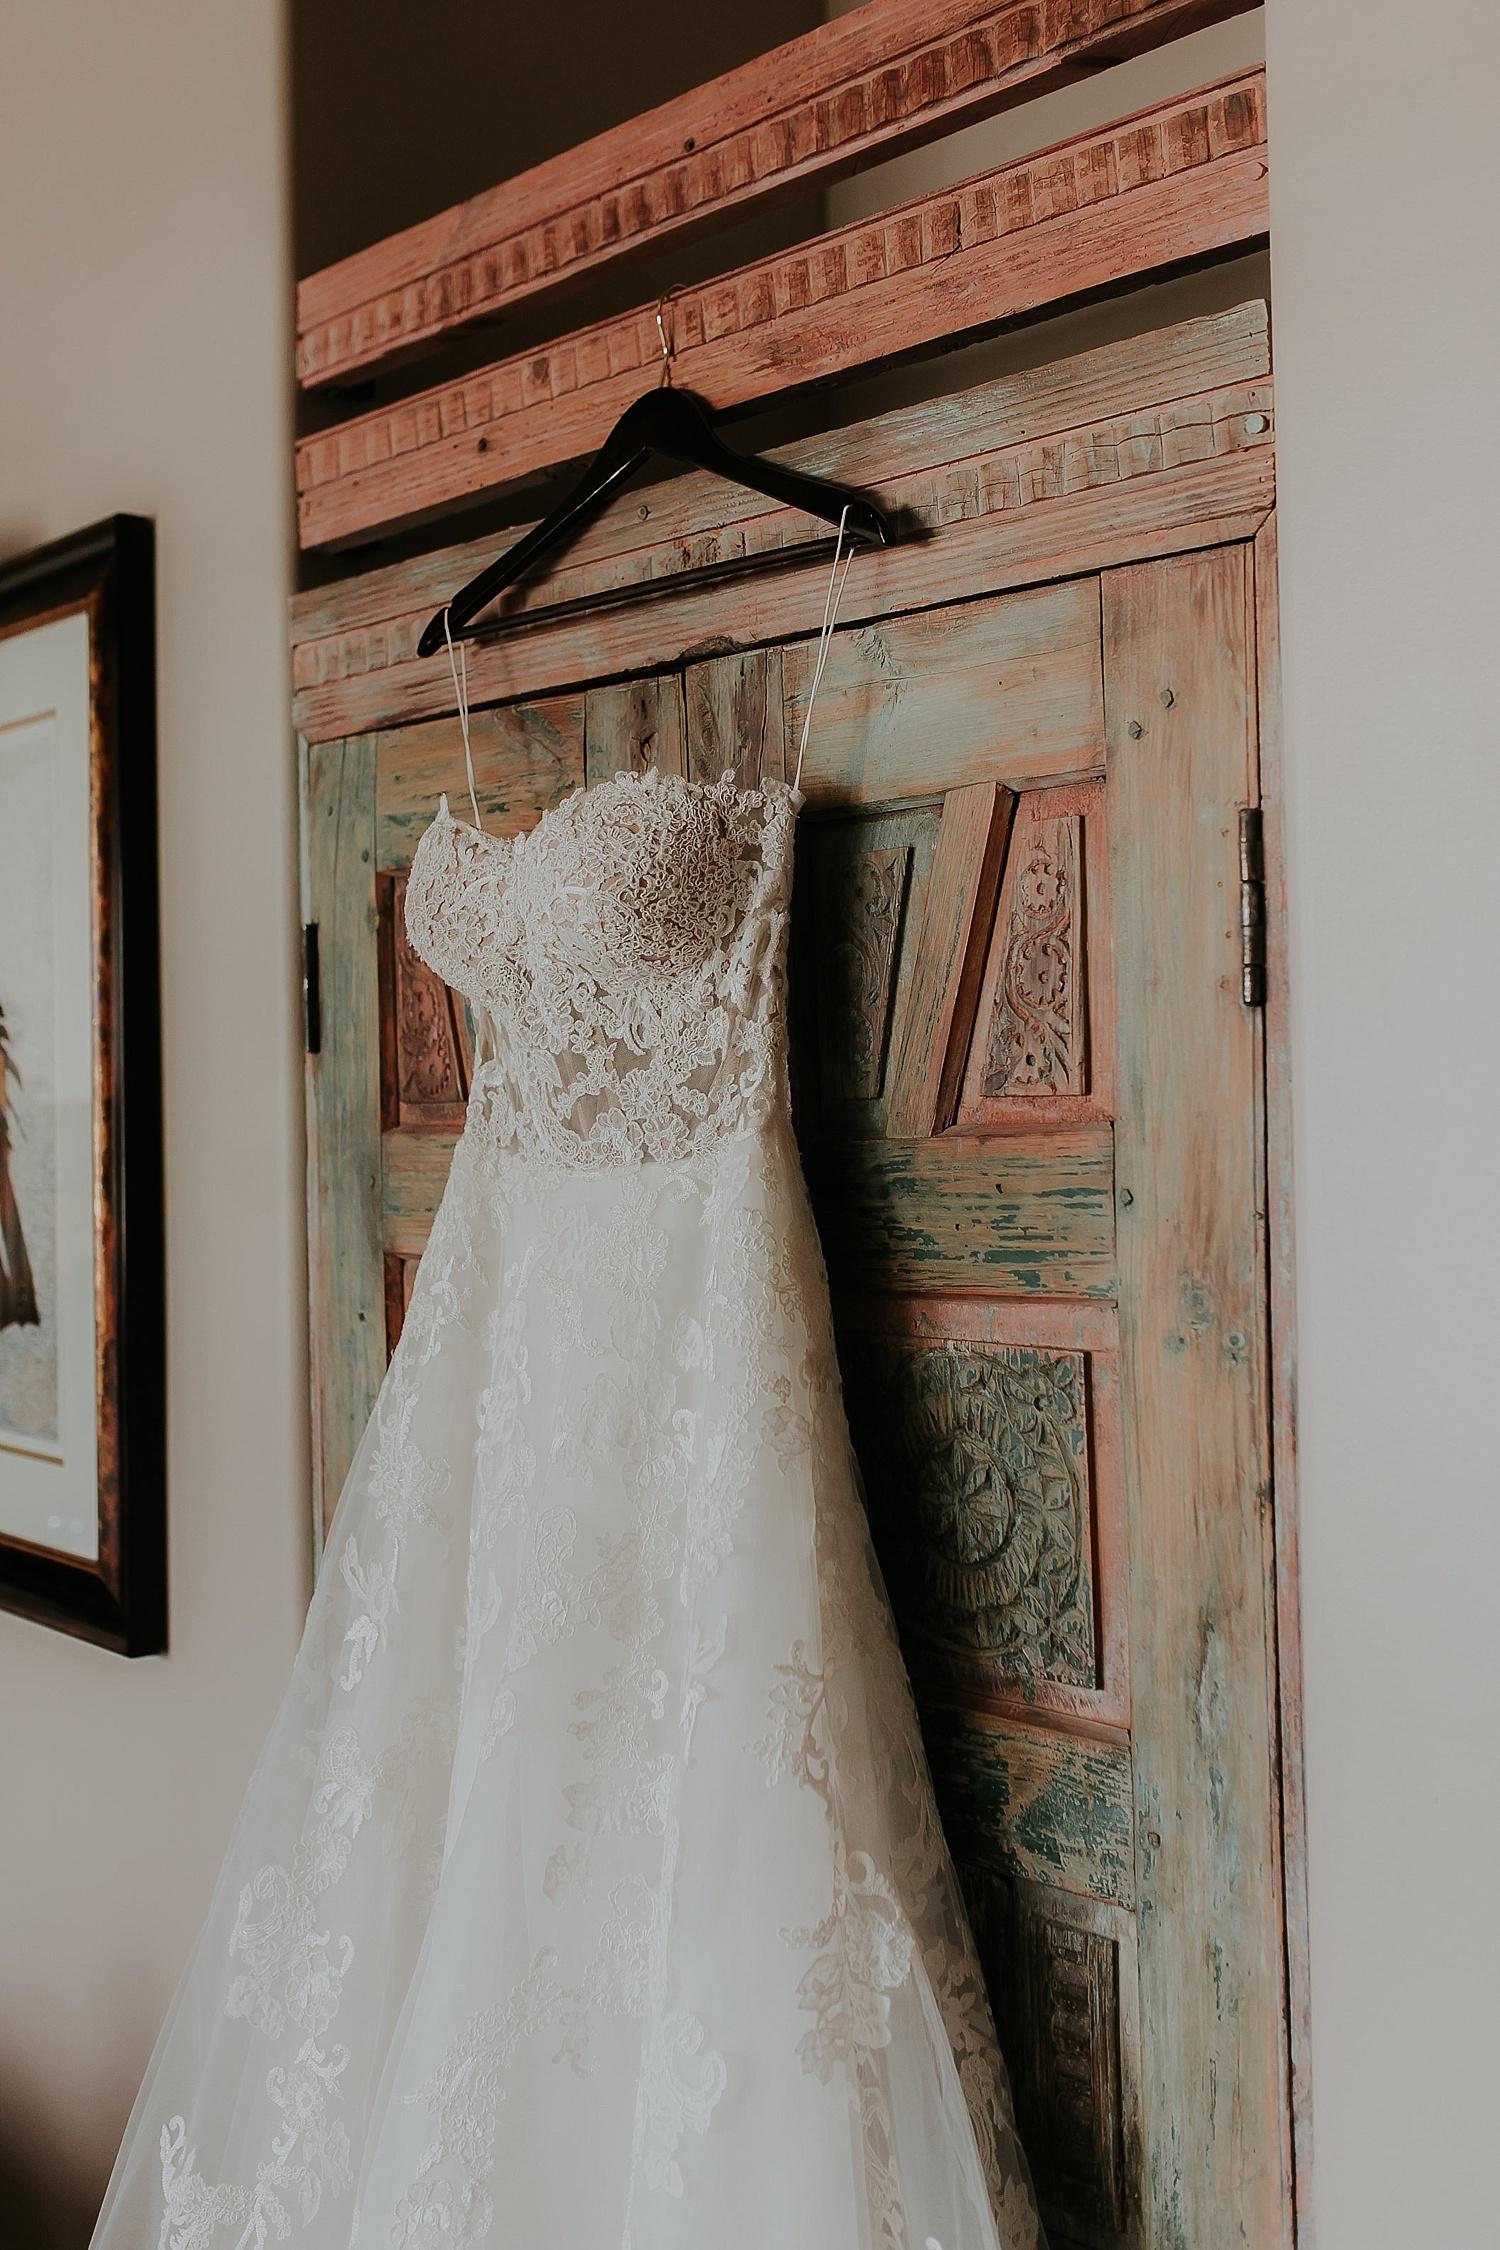 Alicia+lucia+photography+-+albuquerque+wedding+photographer+-+santa+fe+wedding+photography+-+new+mexico+wedding+photographer+-+gerald+peters+gallery+wedding_0005.jpg